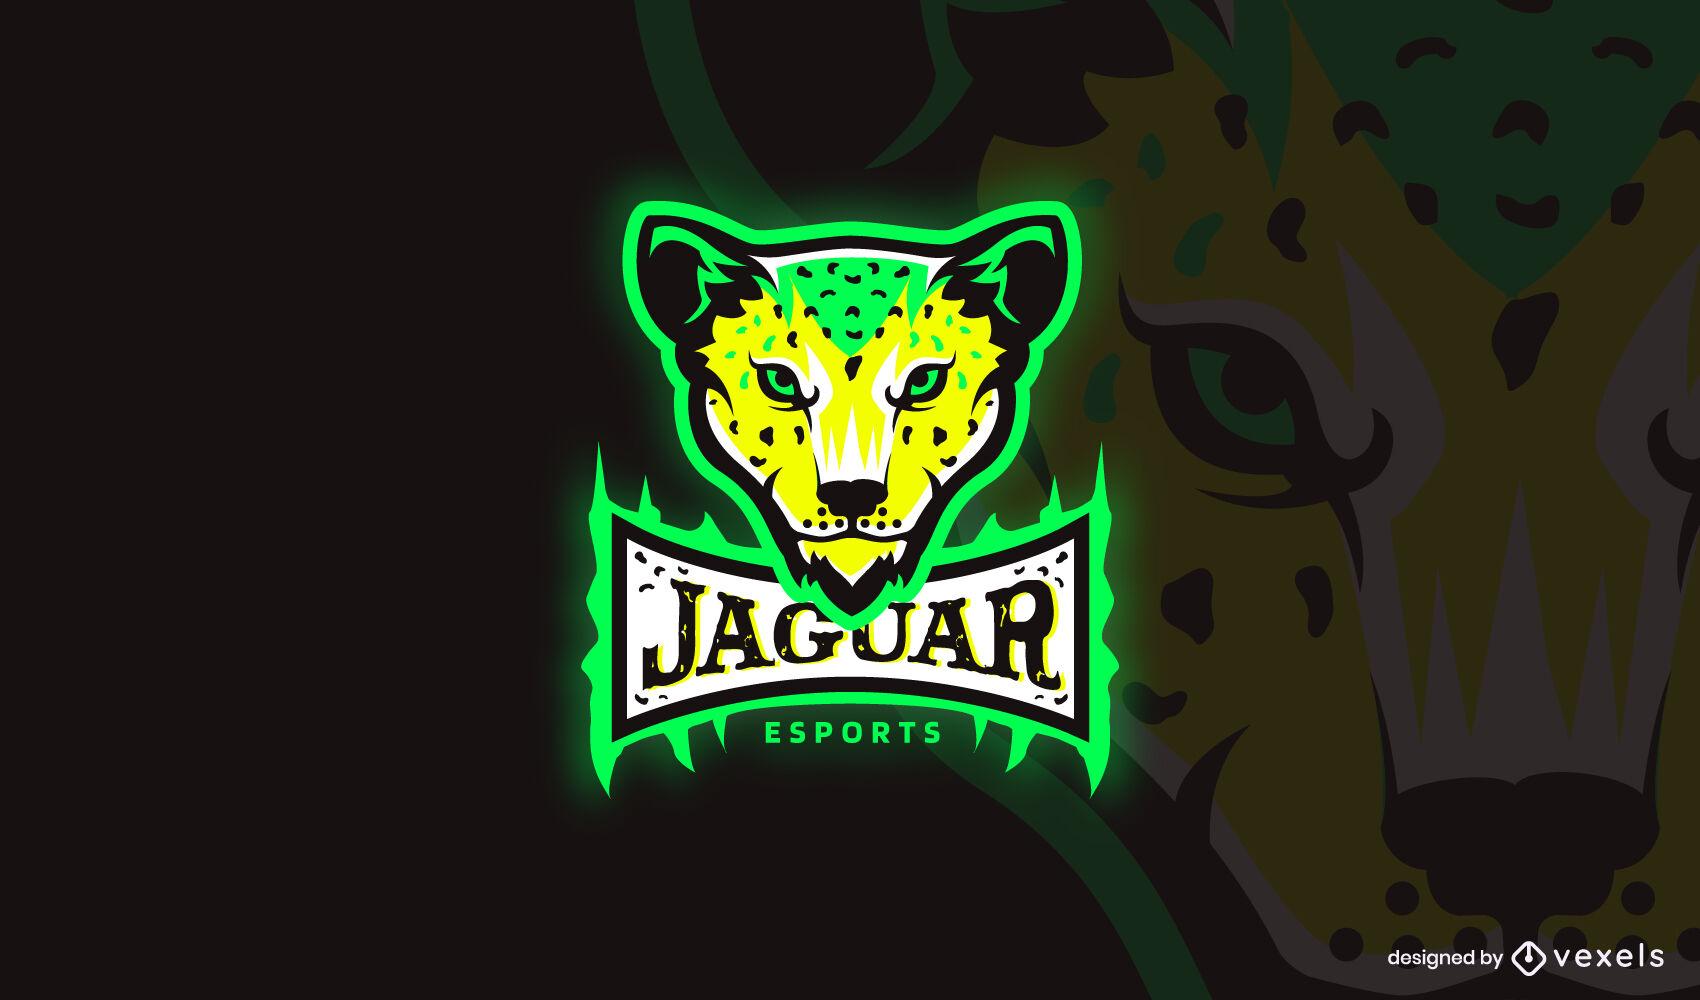 Jaguar neon logo